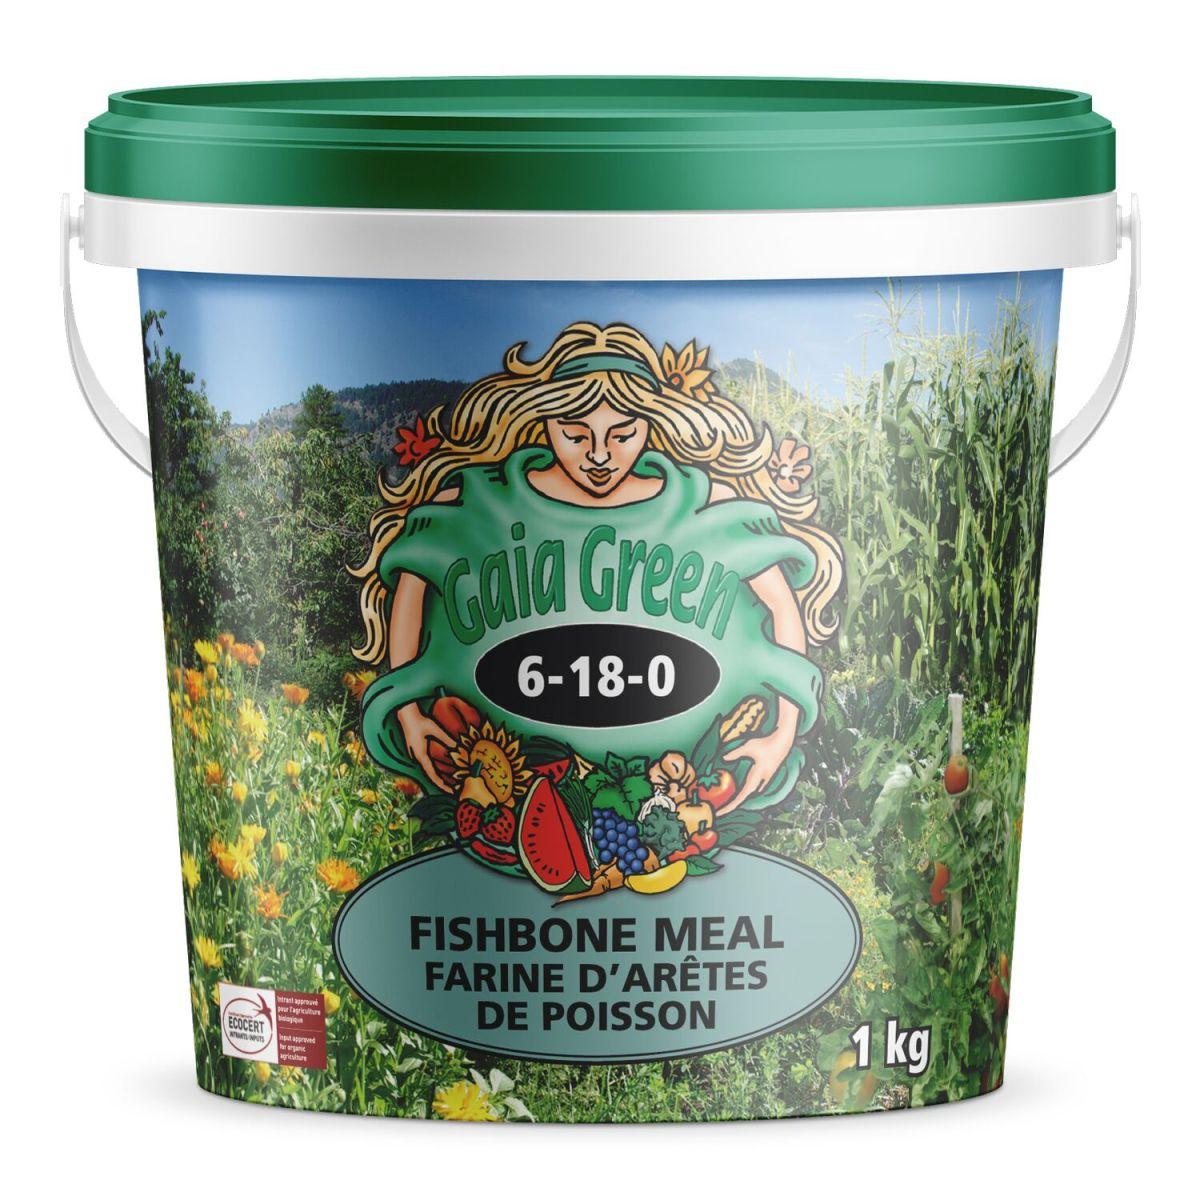 Fishbone meal